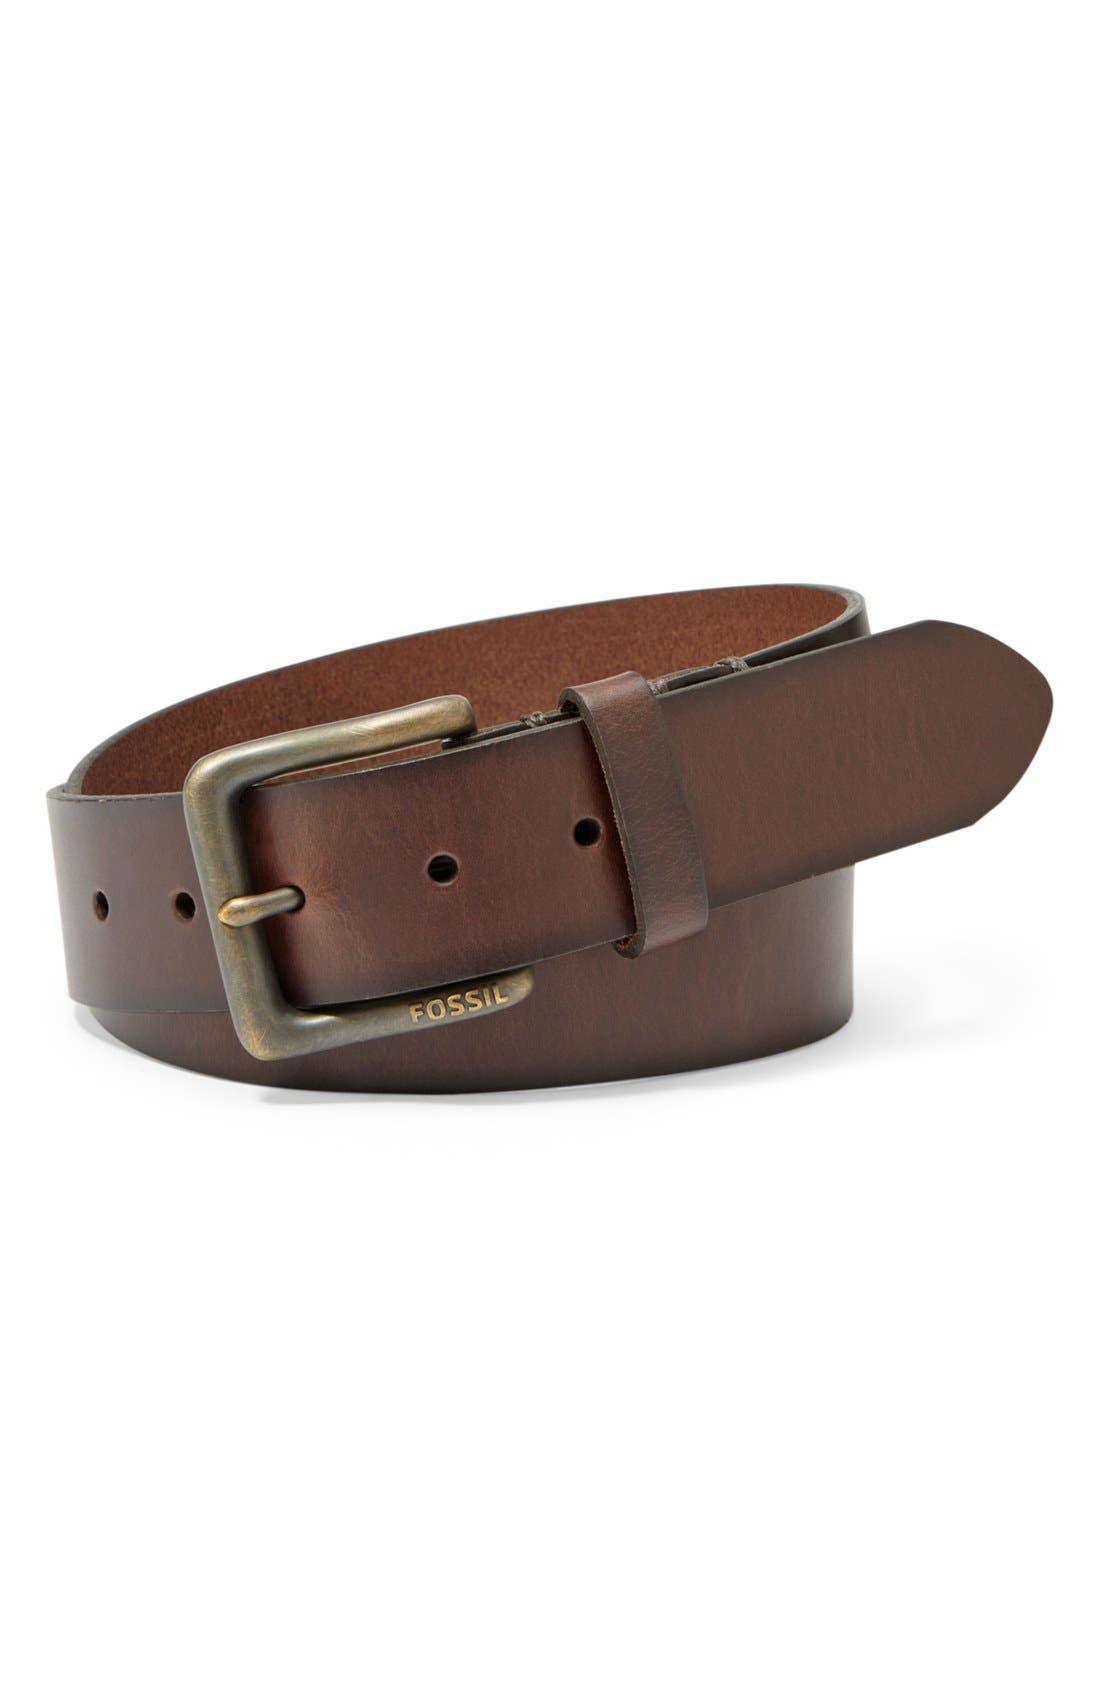 Fossil 'Artie' Belt